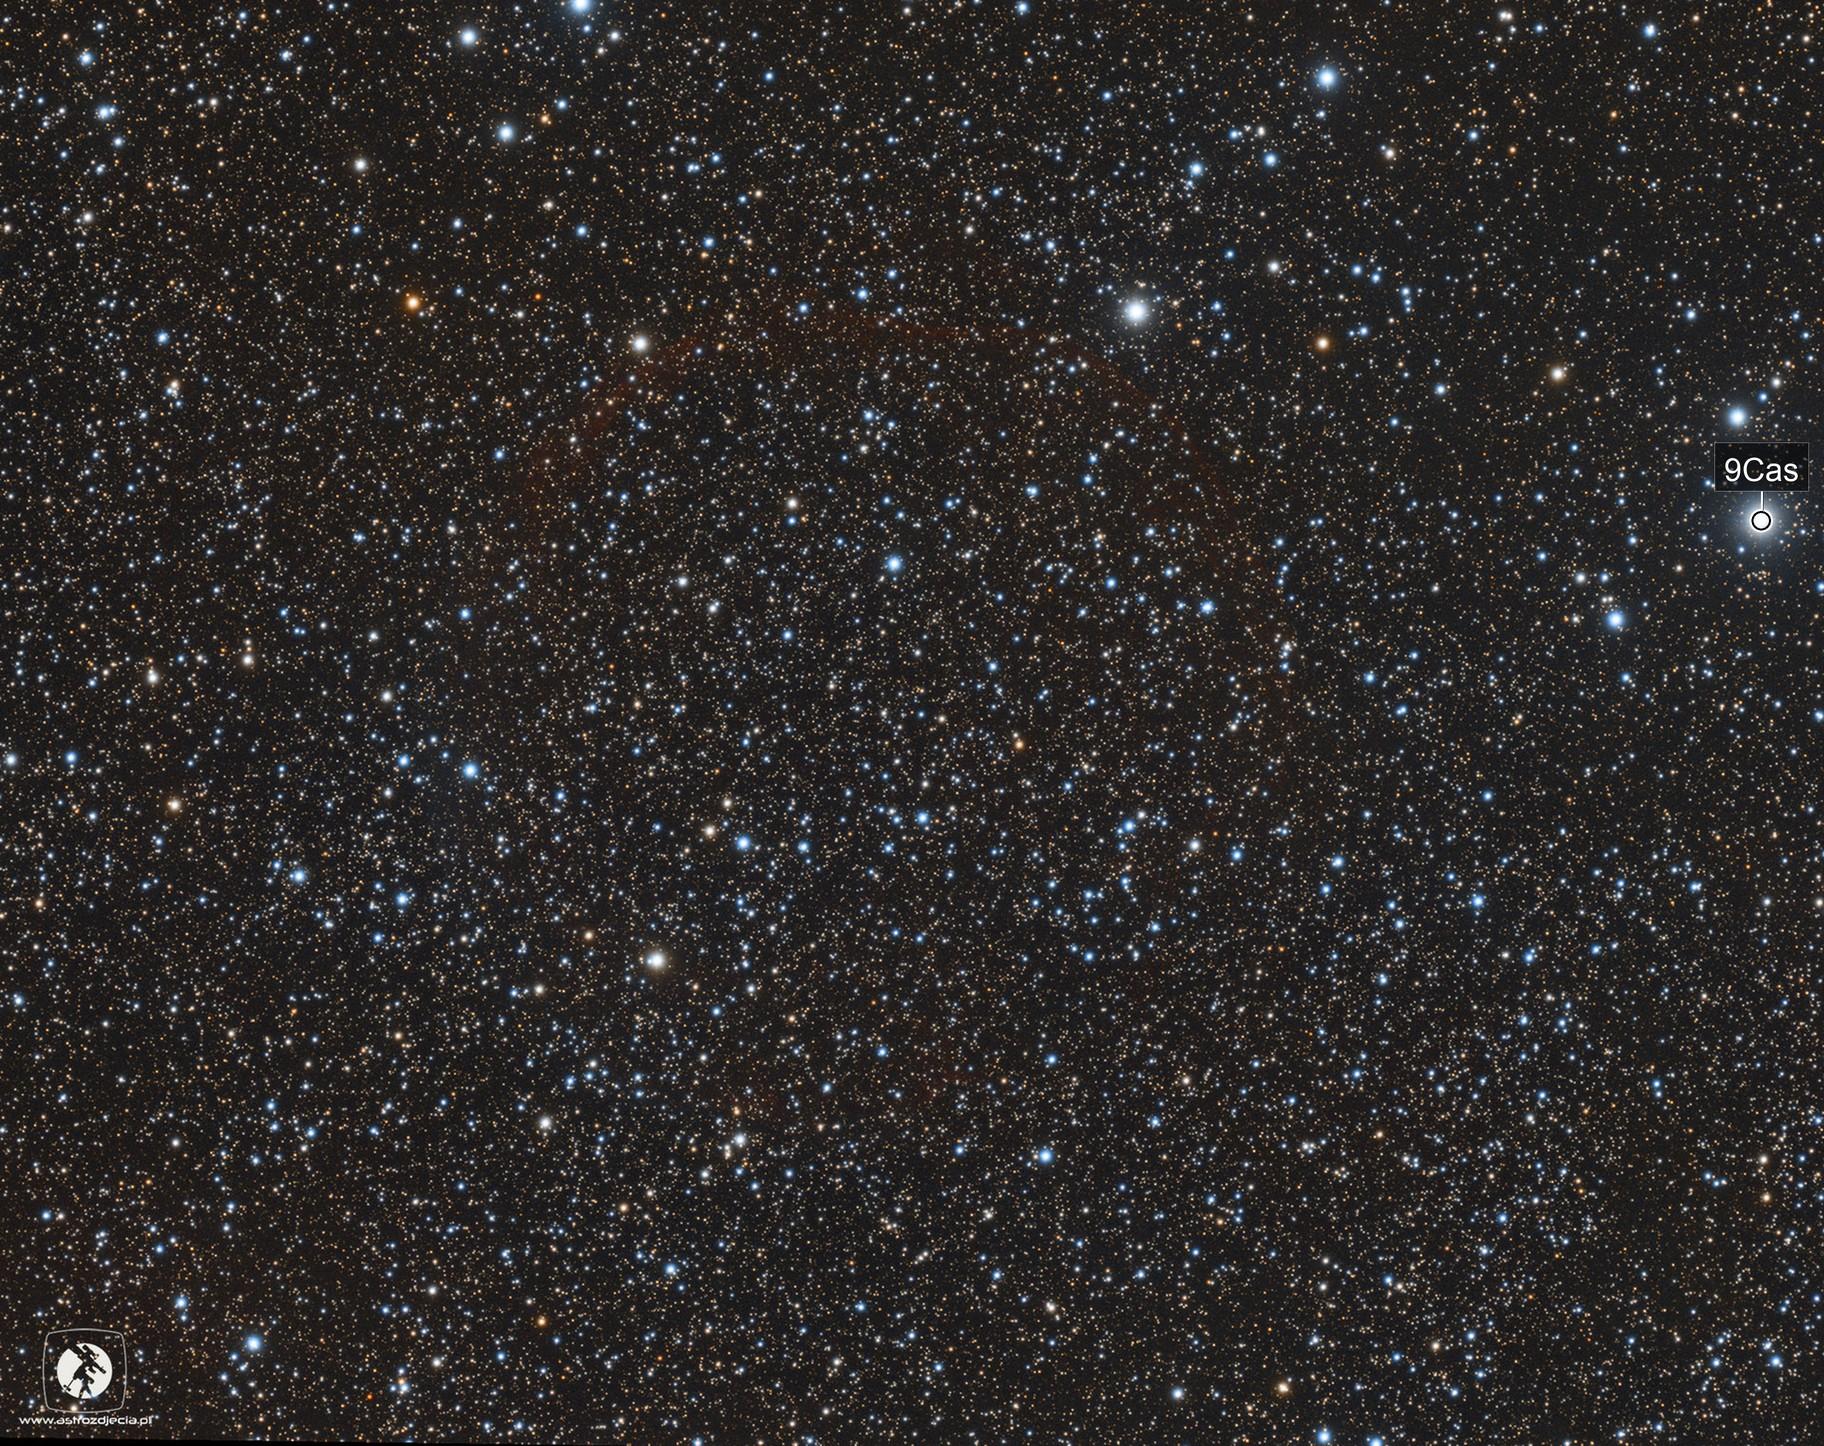 CTB1 / Abell 85 / SNR G116.9+00.1 / LBN 576